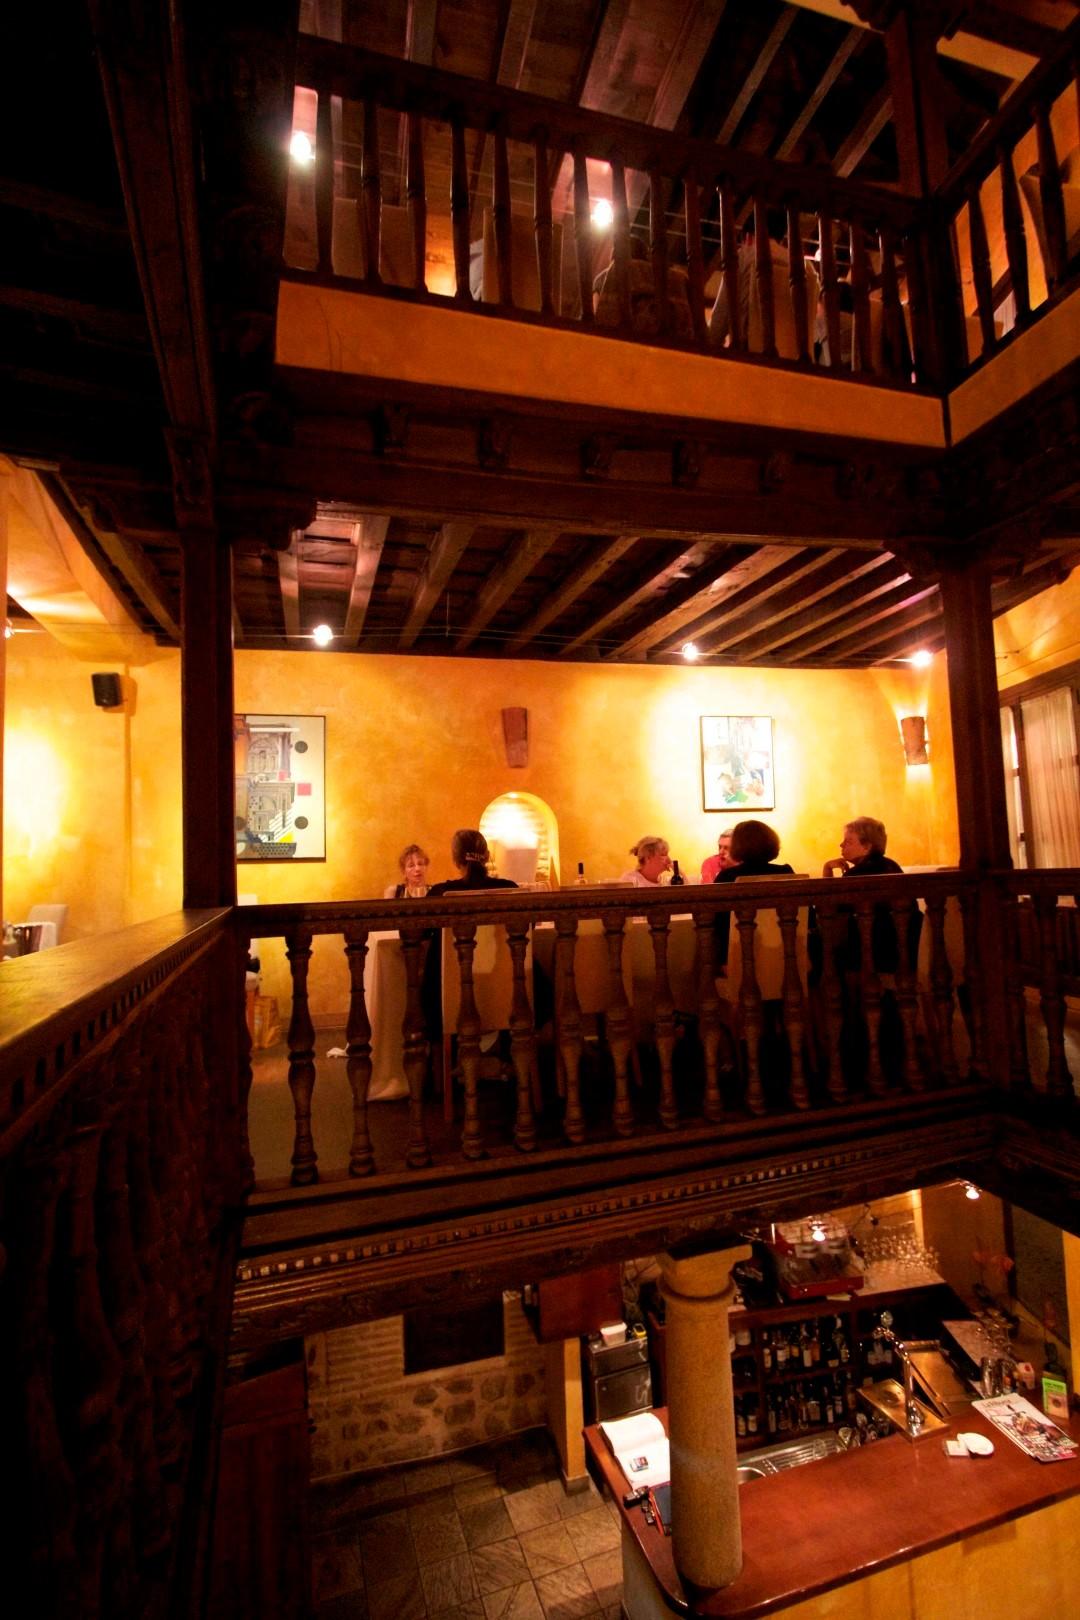 Locum, Toledo, Spain, Travelers Roundtable, Robert Bundy